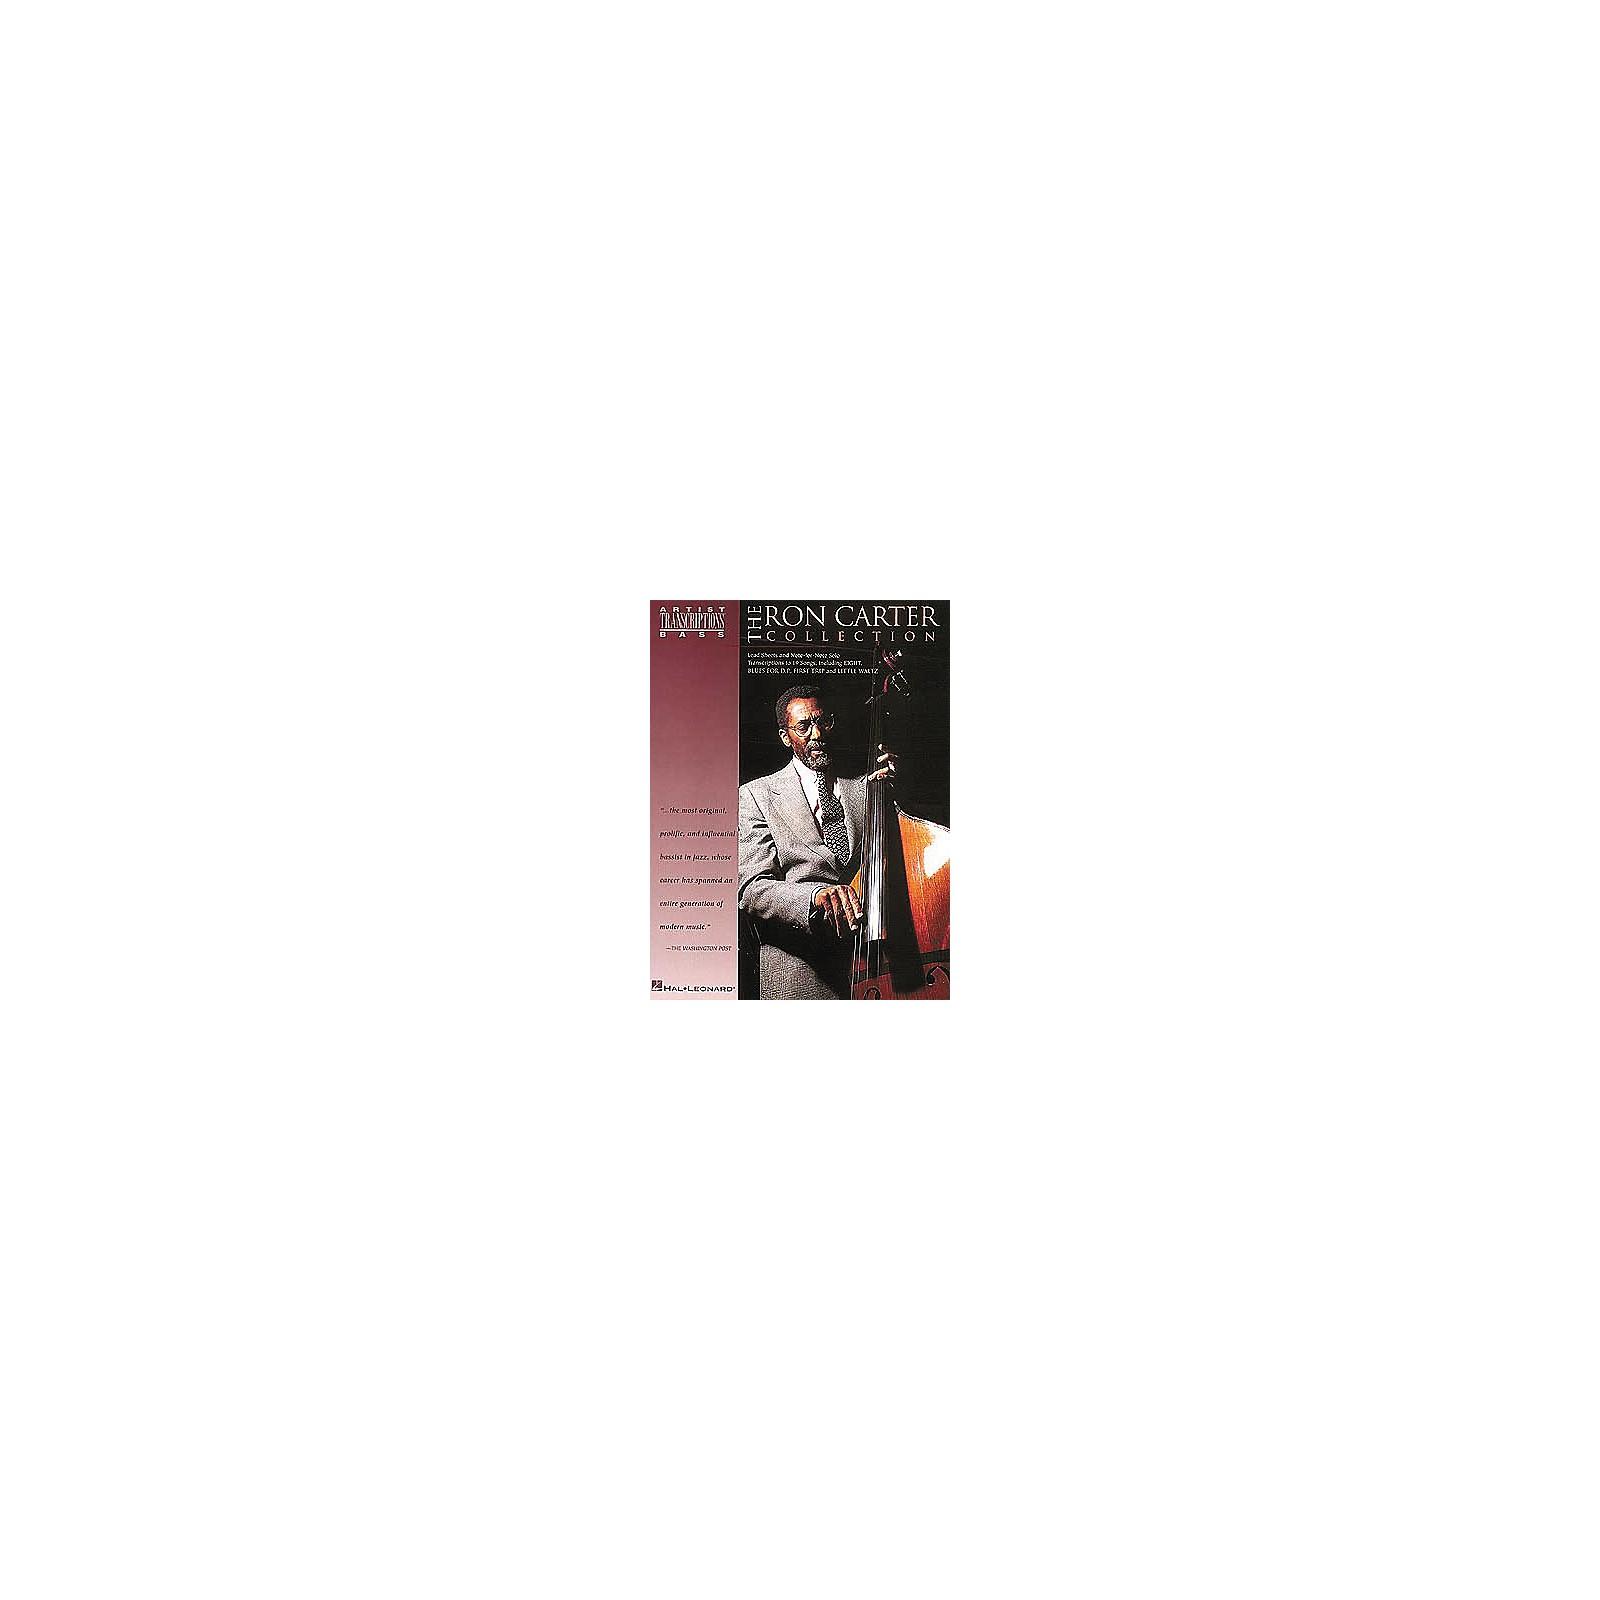 Hal Leonard Ron Carter Collection Bass Transcriptions Book